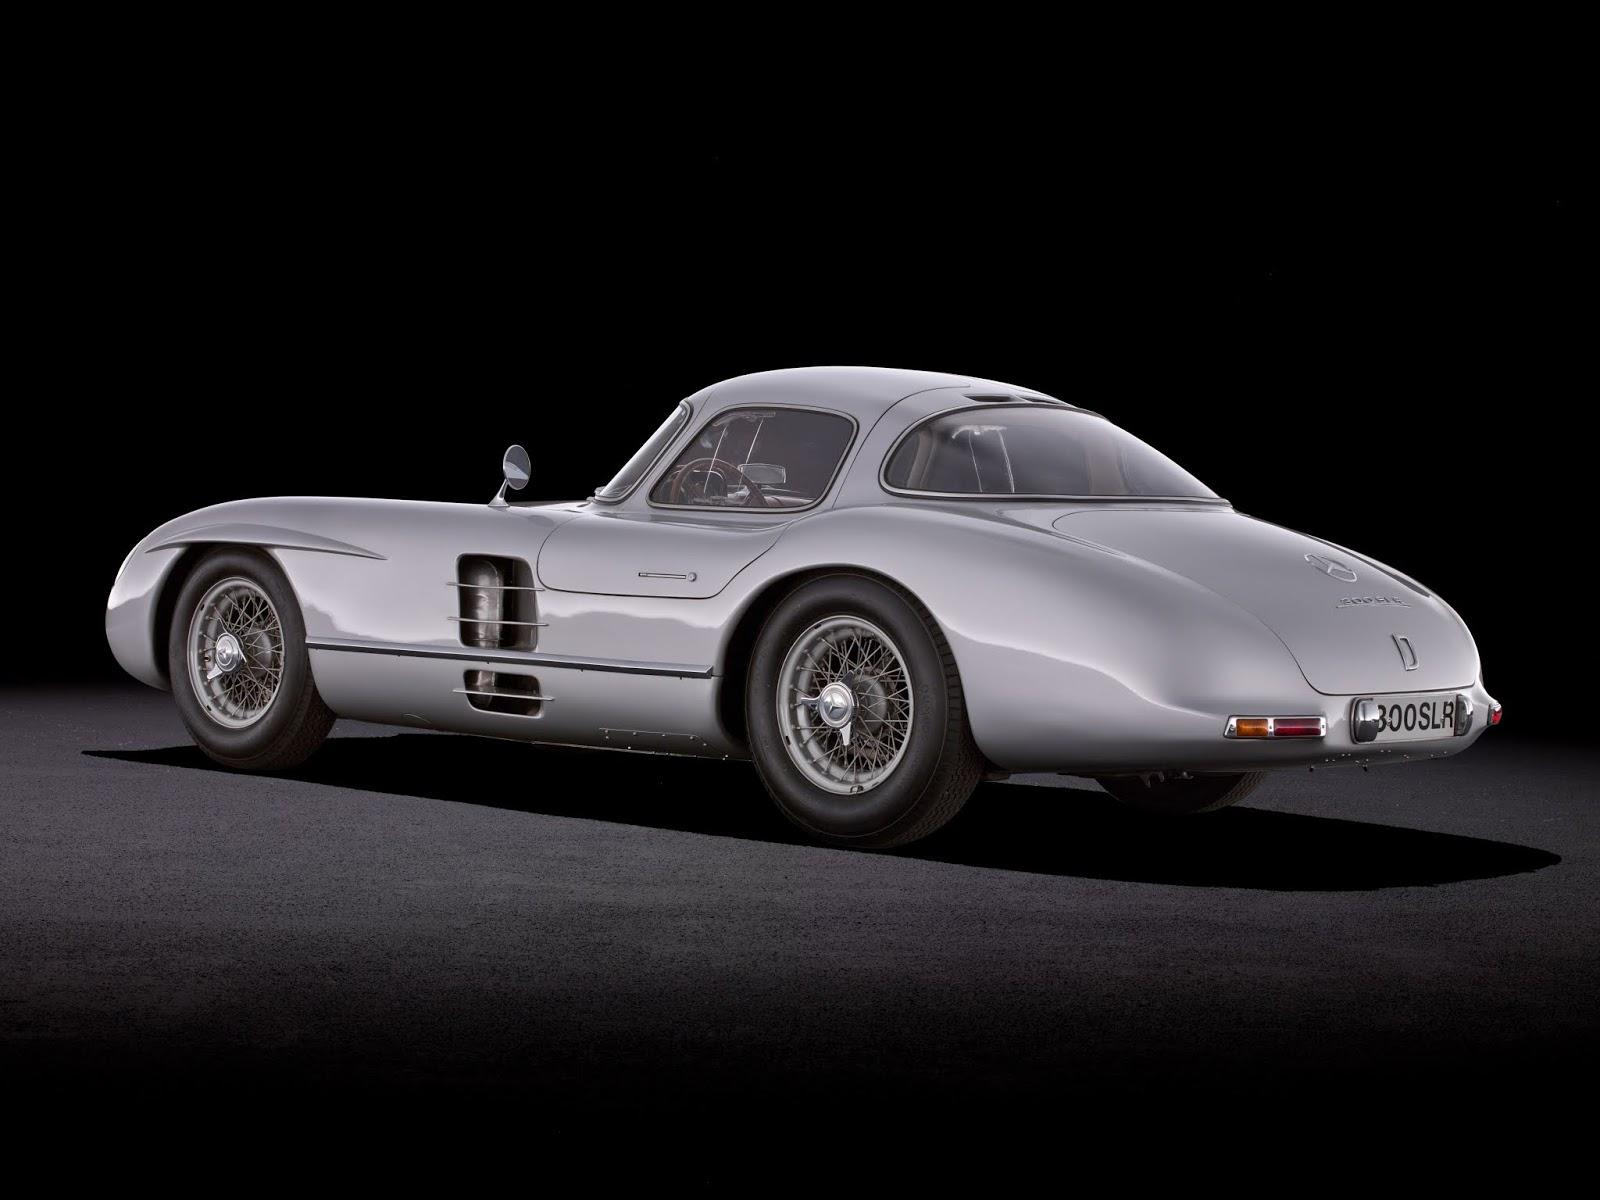 D140598 Ποια είναι η θρυλική 300 SLR 300 SLR, Benz, Mercedes, Mercedes Benz, retrocar, retrocar sunday, vintage, zblog